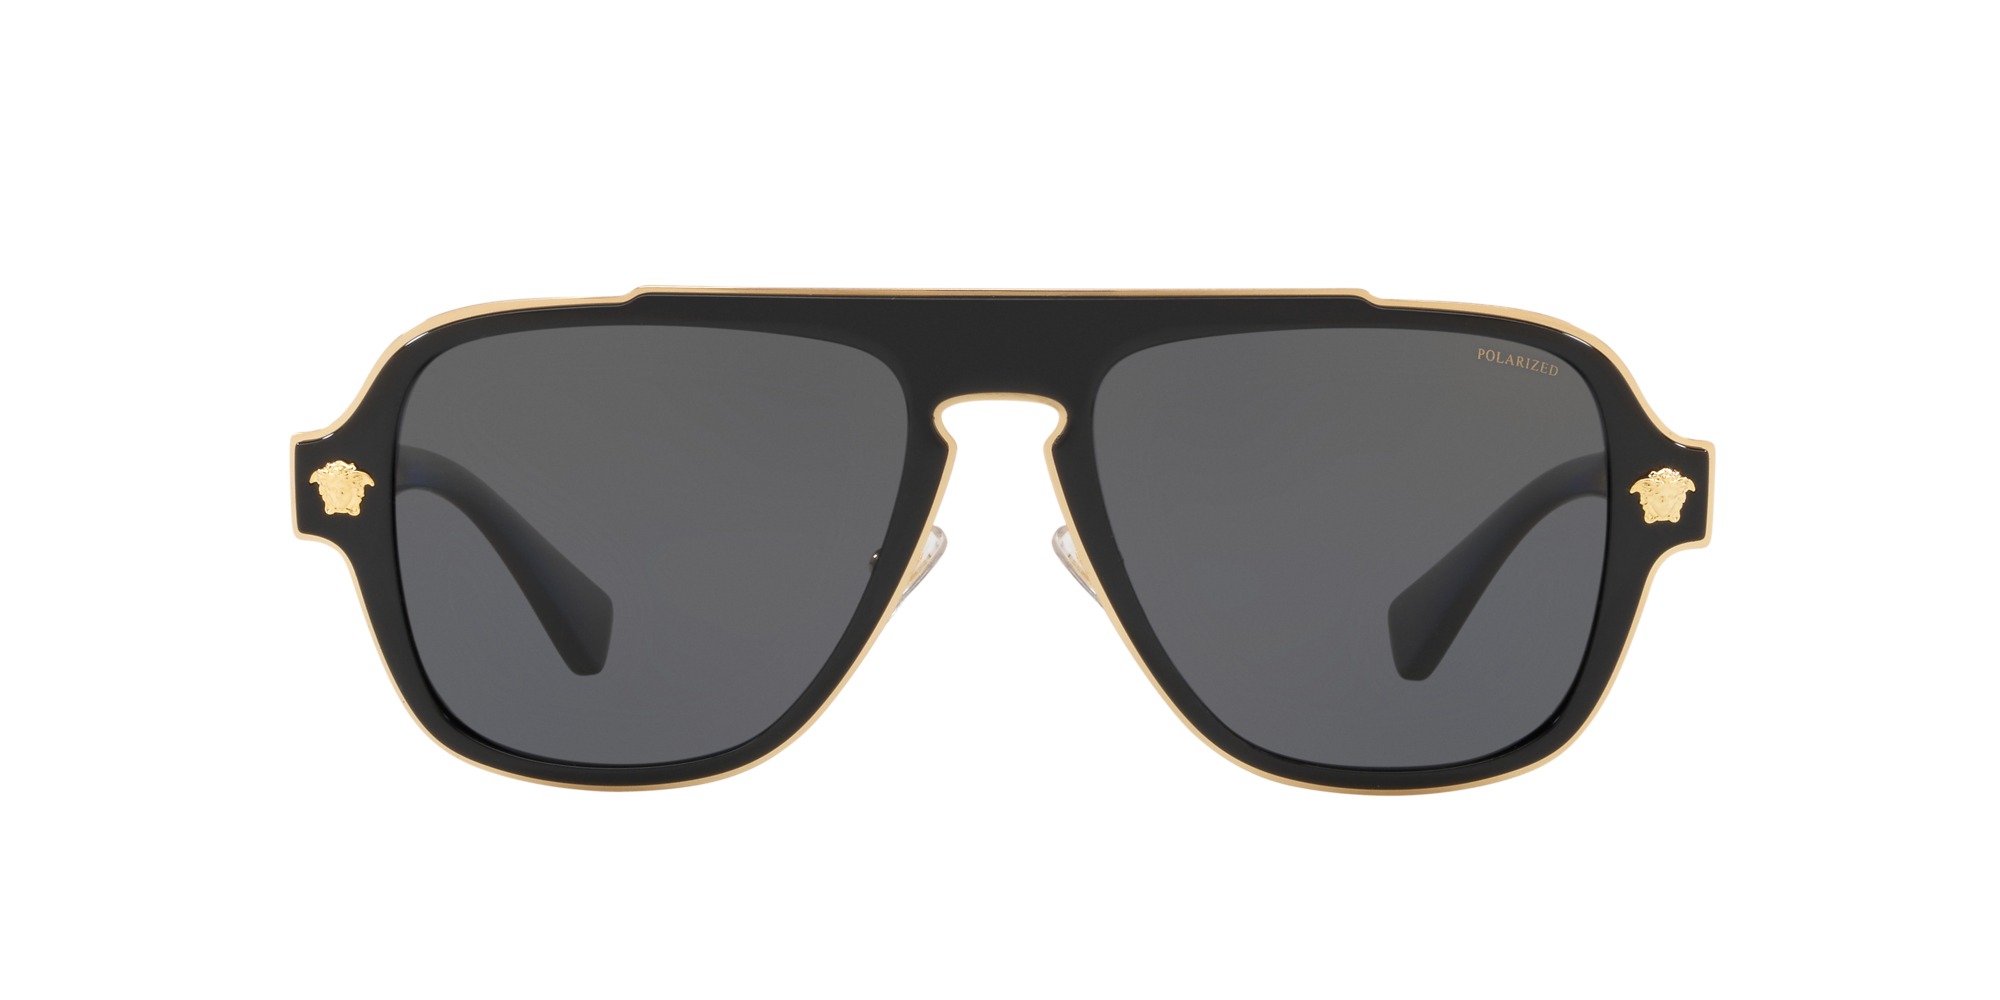 Image for VE2199 56 MEDUSA CHARM from LensCrafters | Glasses, Prescription Glasses Online, Eyewear